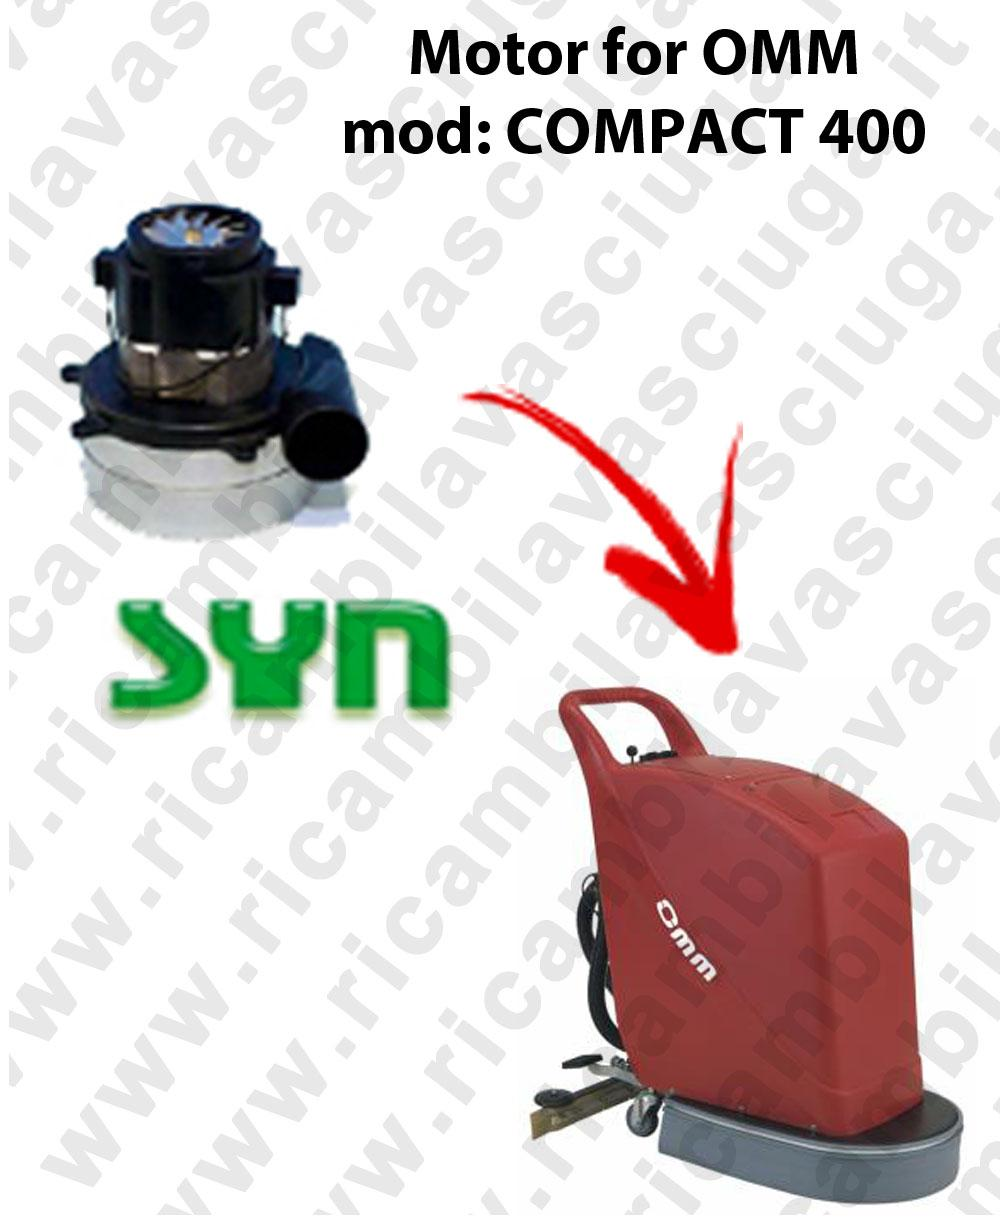 COMPACT 400 MOTORE SYNCLEAN di aspirazione para fregadora OMM